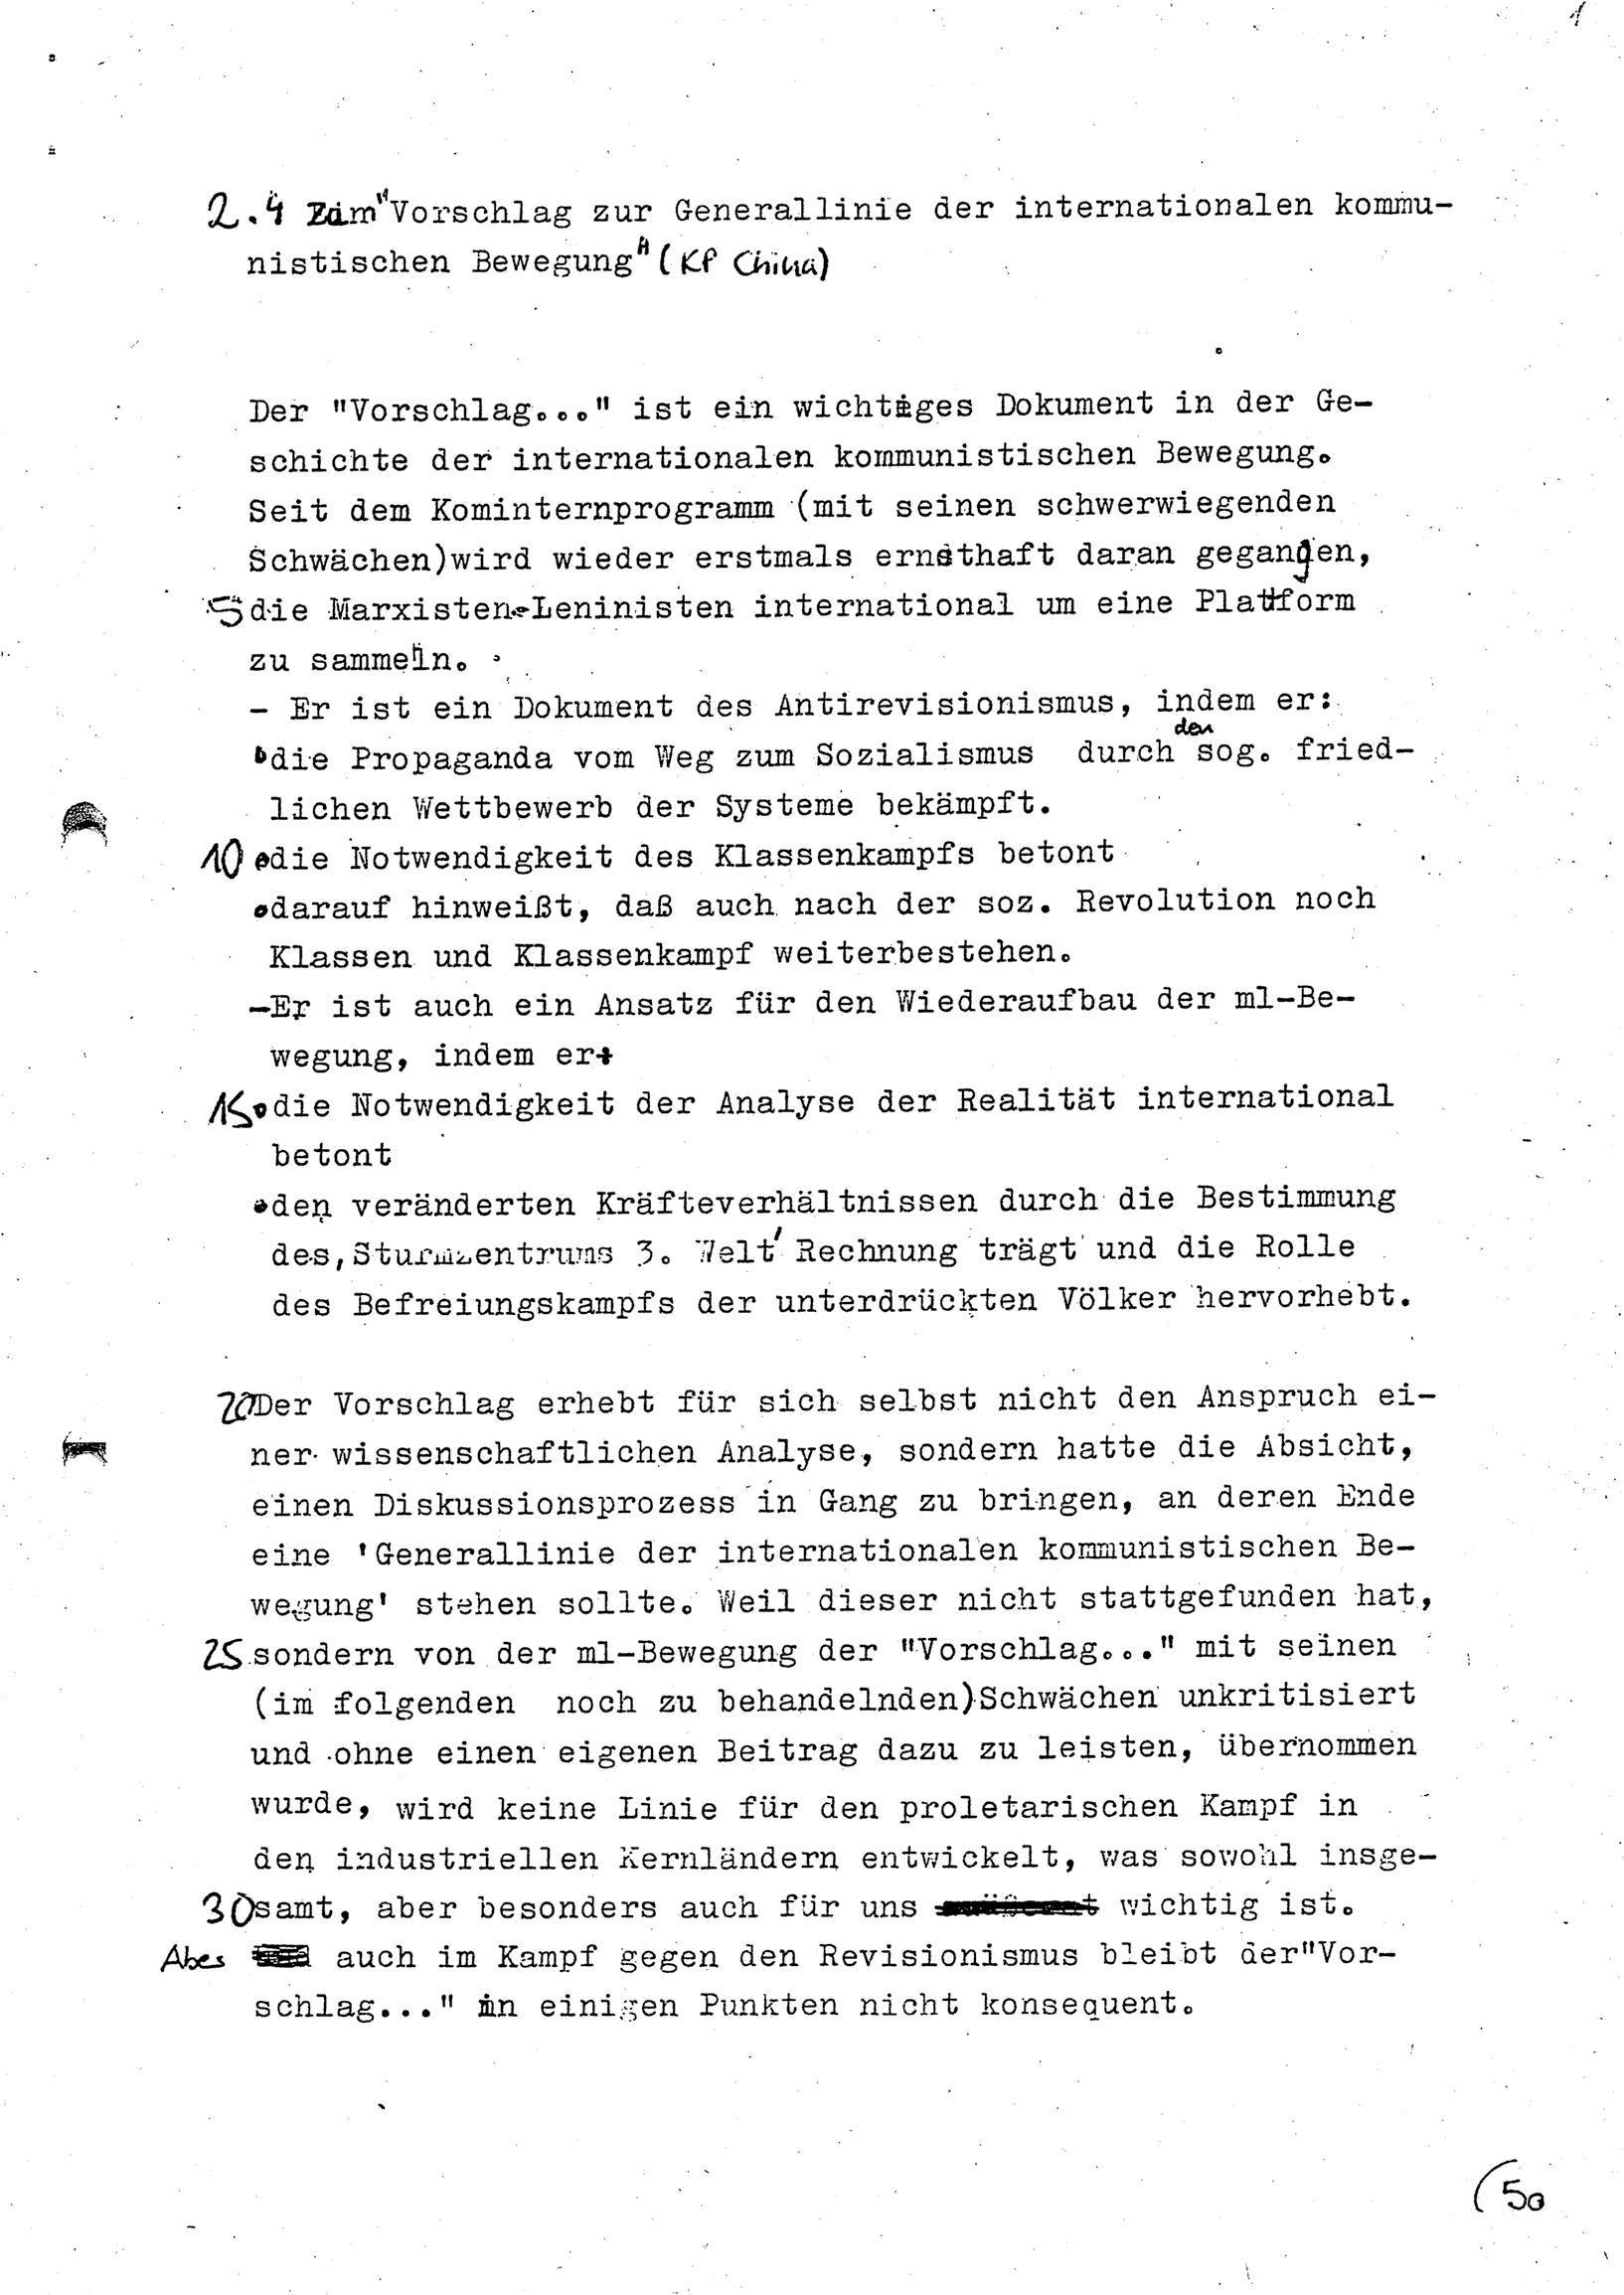 Ulm_KGU_Arbeitsheft_19830425_015_053